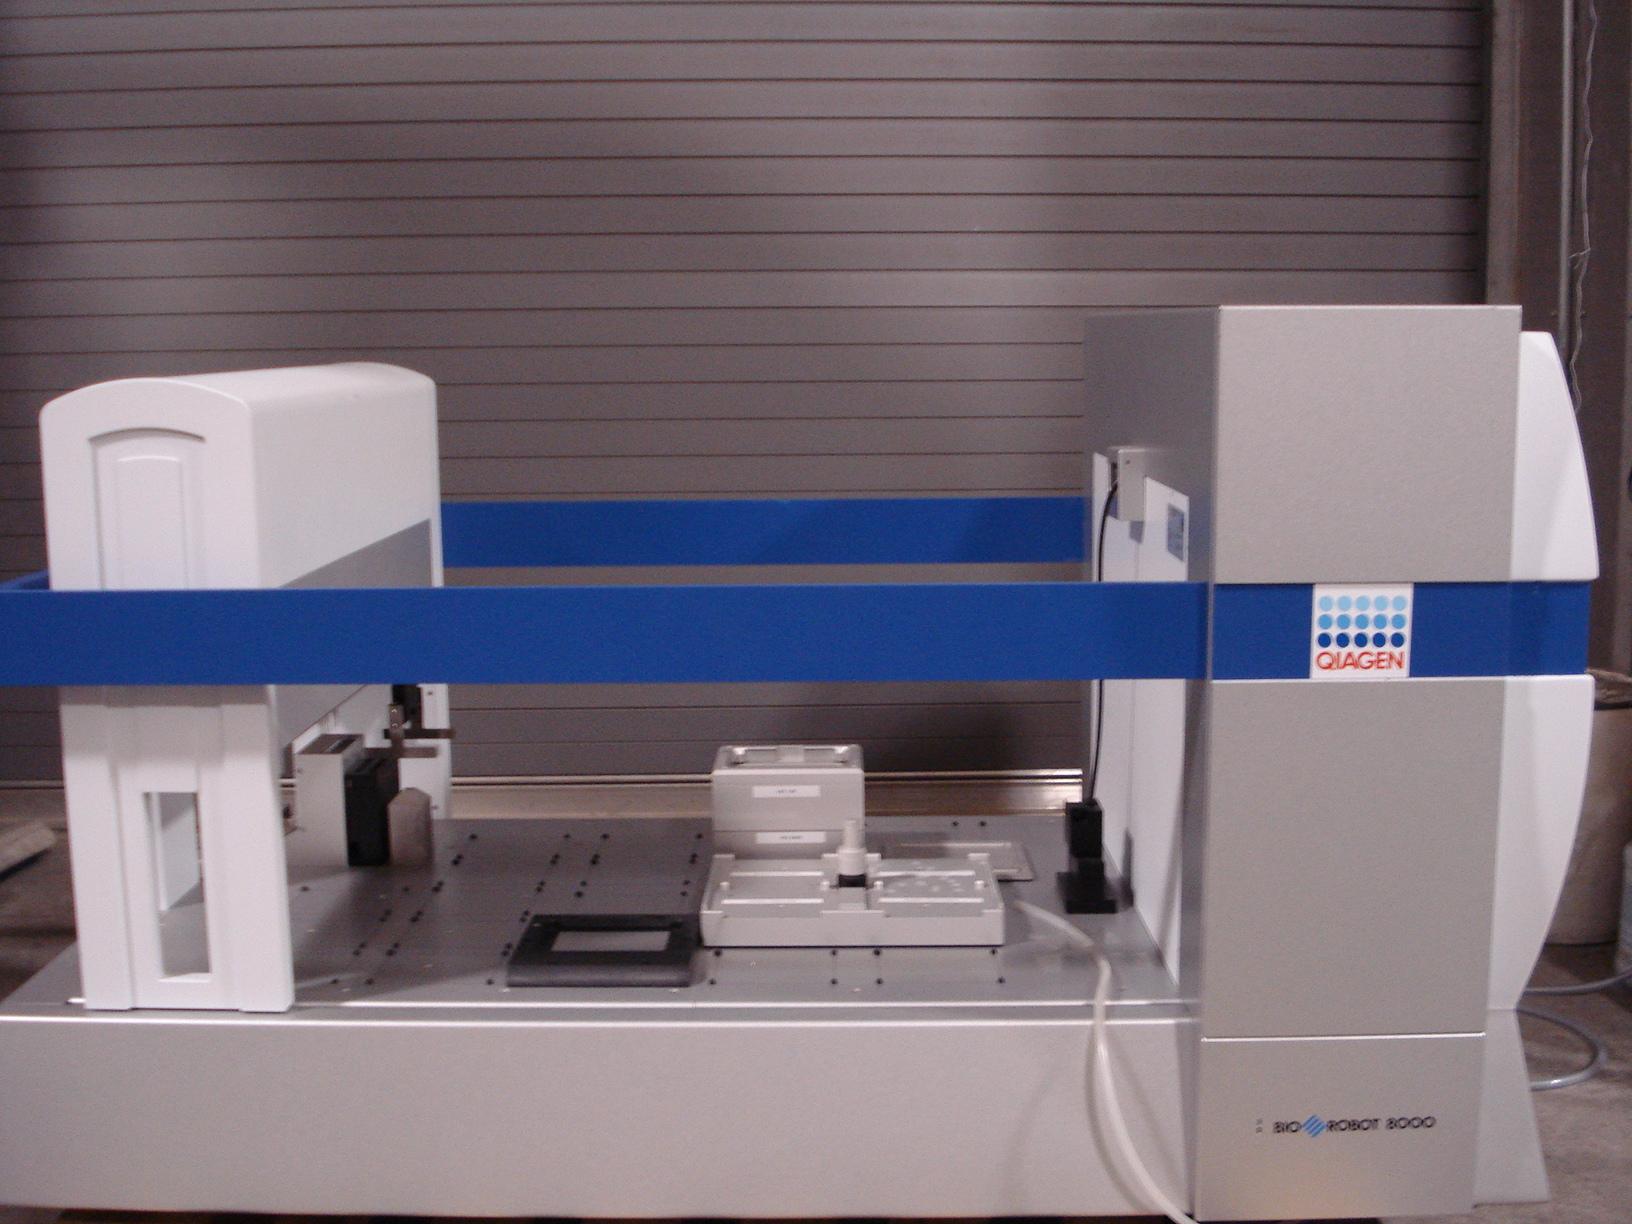 Qiagen BioRobot 8000 Image